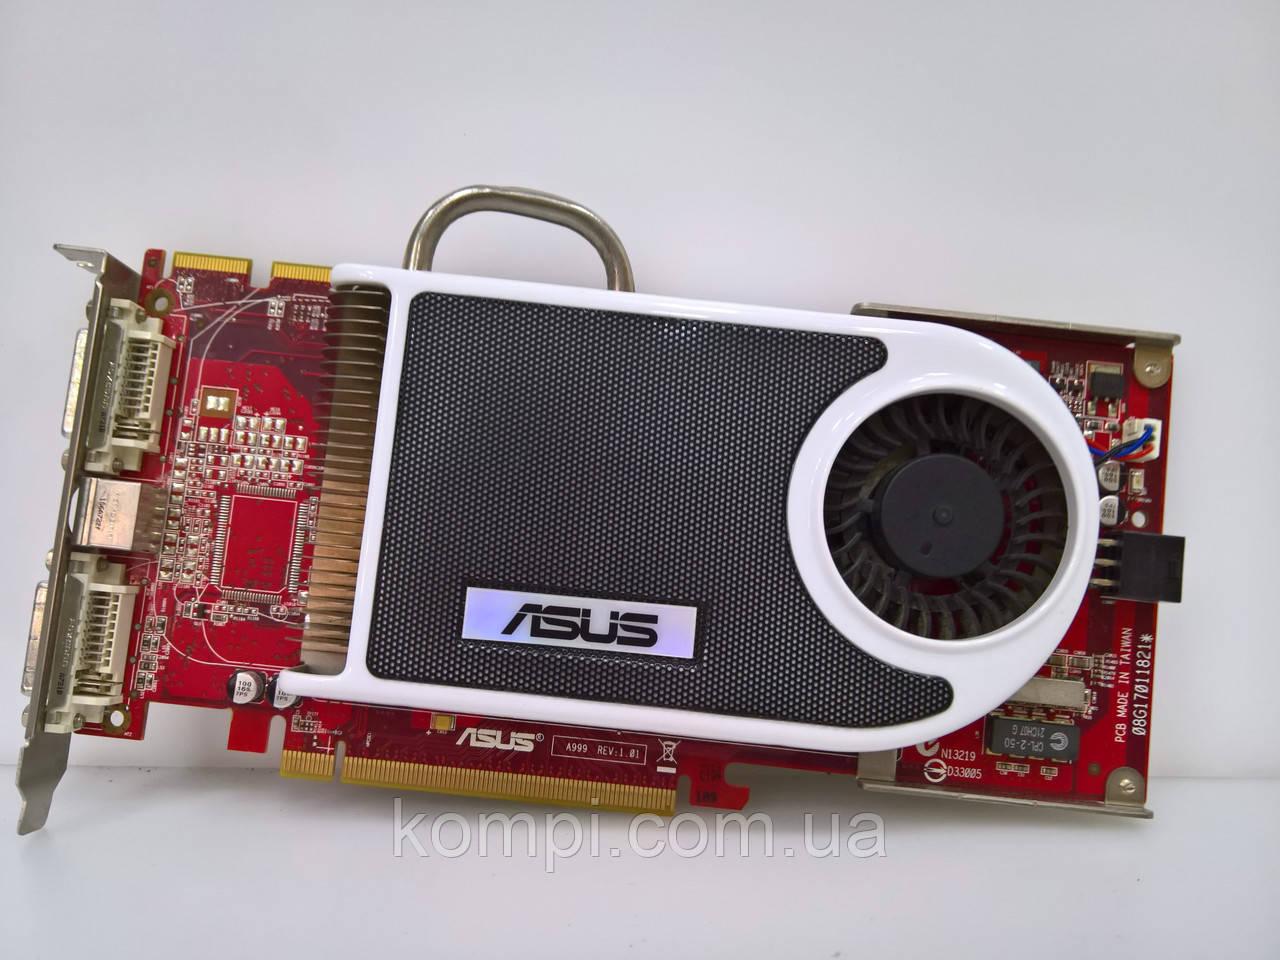 Видеокарта ATI RADEON X1950 PRO 256MB / 256 BIT PCI-E